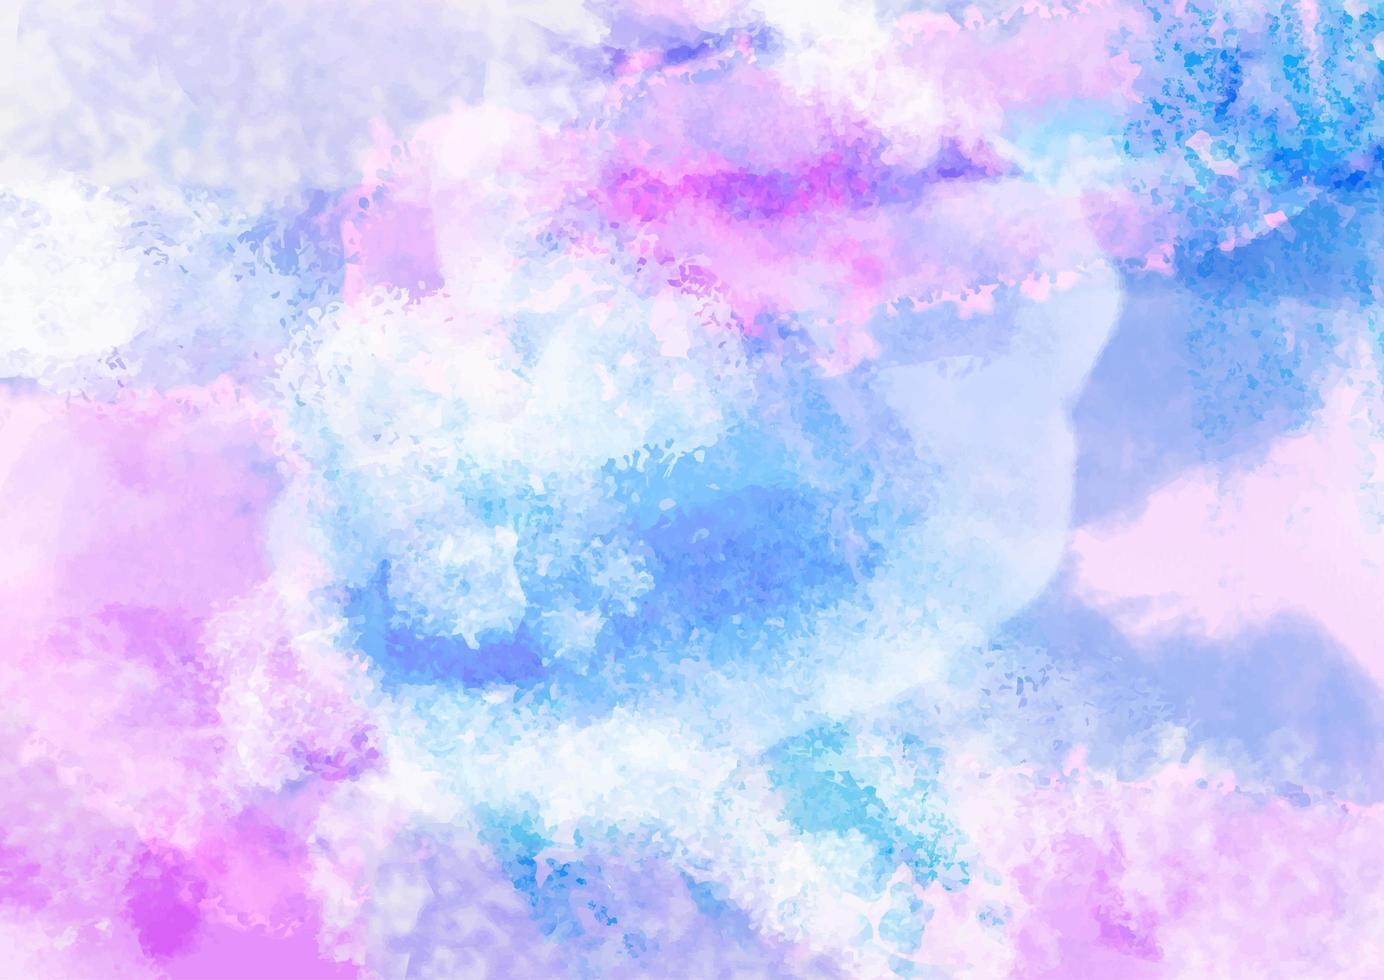 Pastell Aquarell Hintergrund vektor